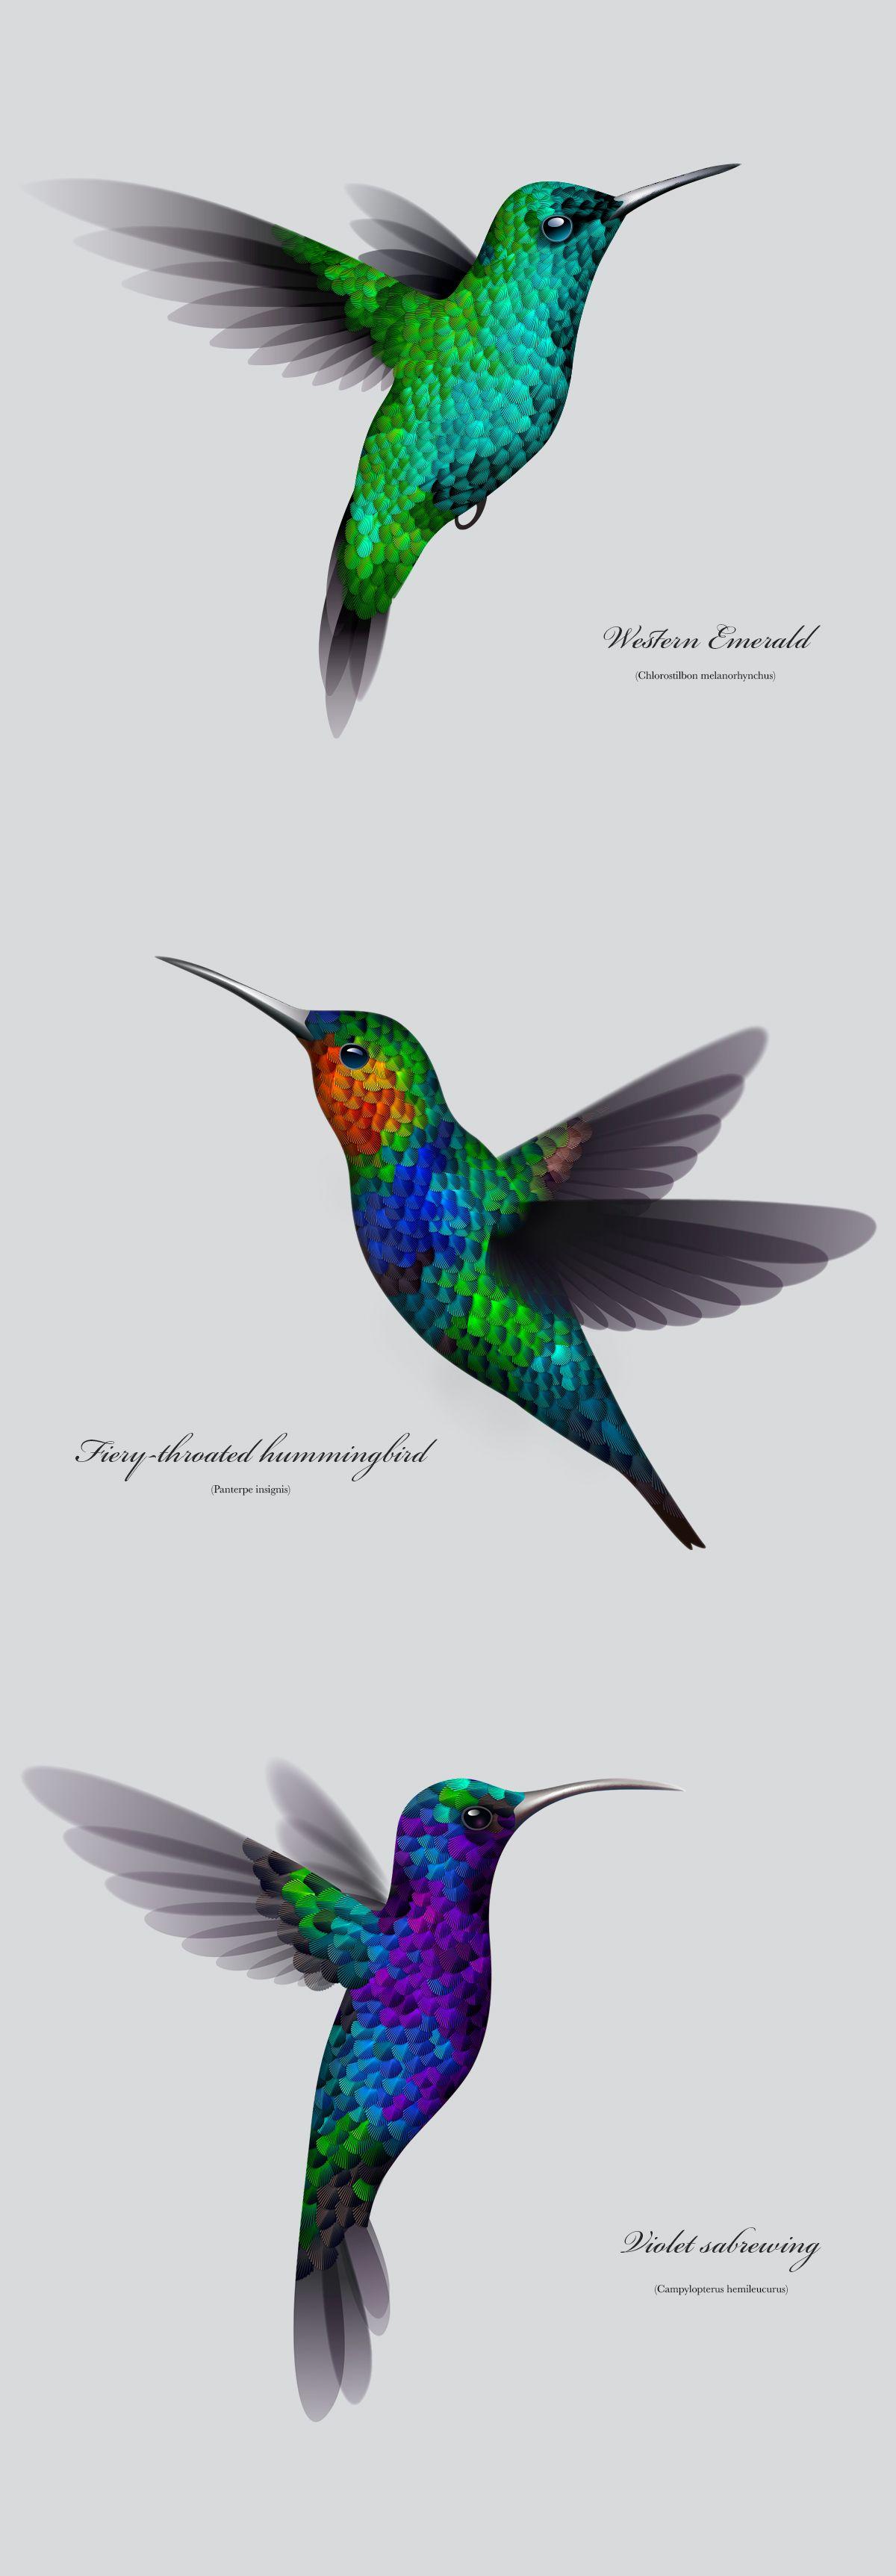 Colibri Color Hummingbird Painting Hummingbird Illustration